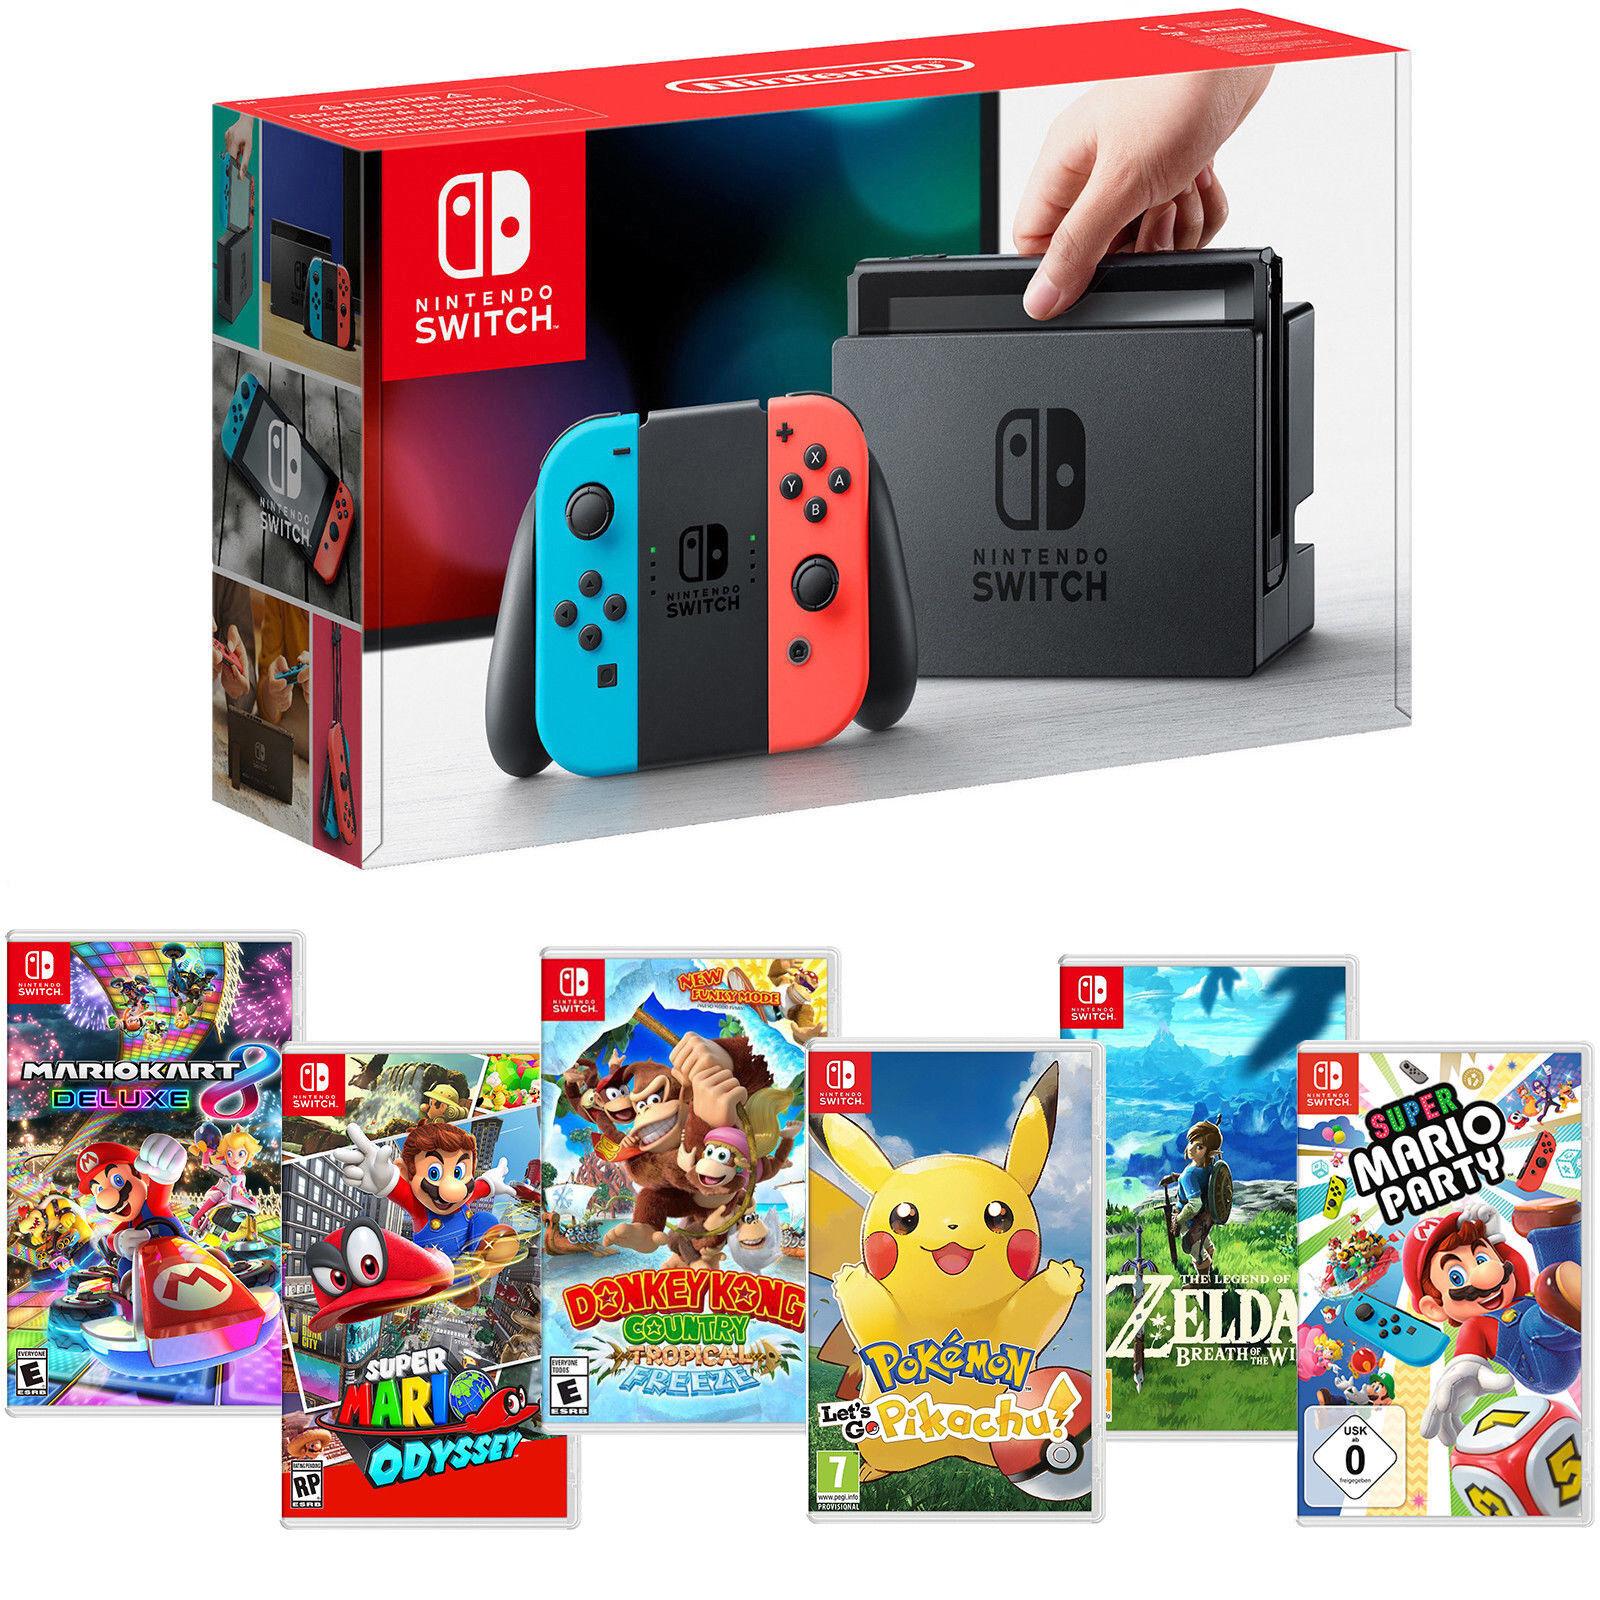 Nintendo Switch Konsole Spiele Neon Pokemon Zelda Mario Party NEU OVP Neuware